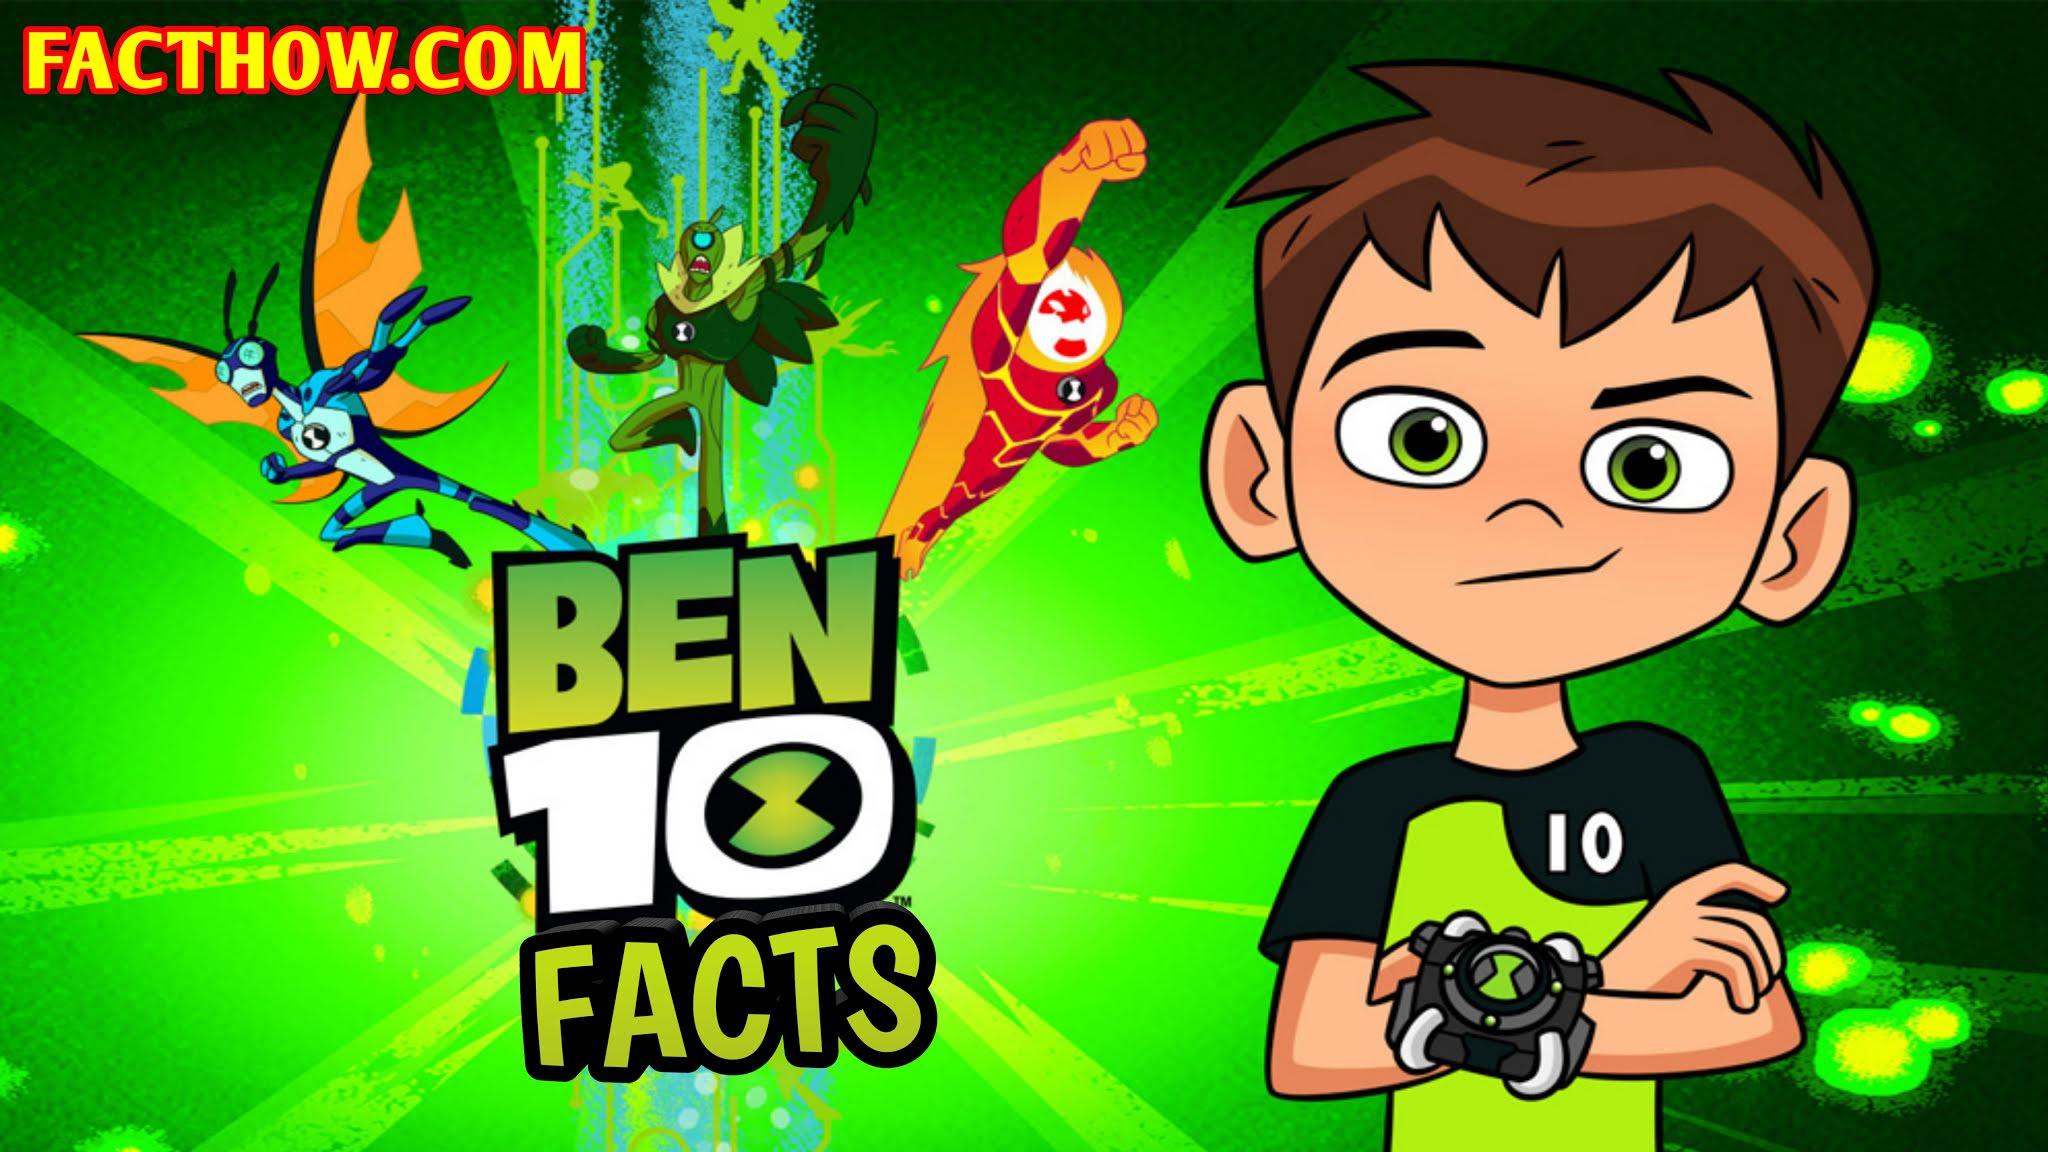 ben-10-facts-hindi-interesting-amazing-facts-facthow-fact-how-ben-gwen-kevin-alien-games-picture-draw-ben10-games-rochak-tathya-majedaar-tathya-facts-2020-grandpa-max